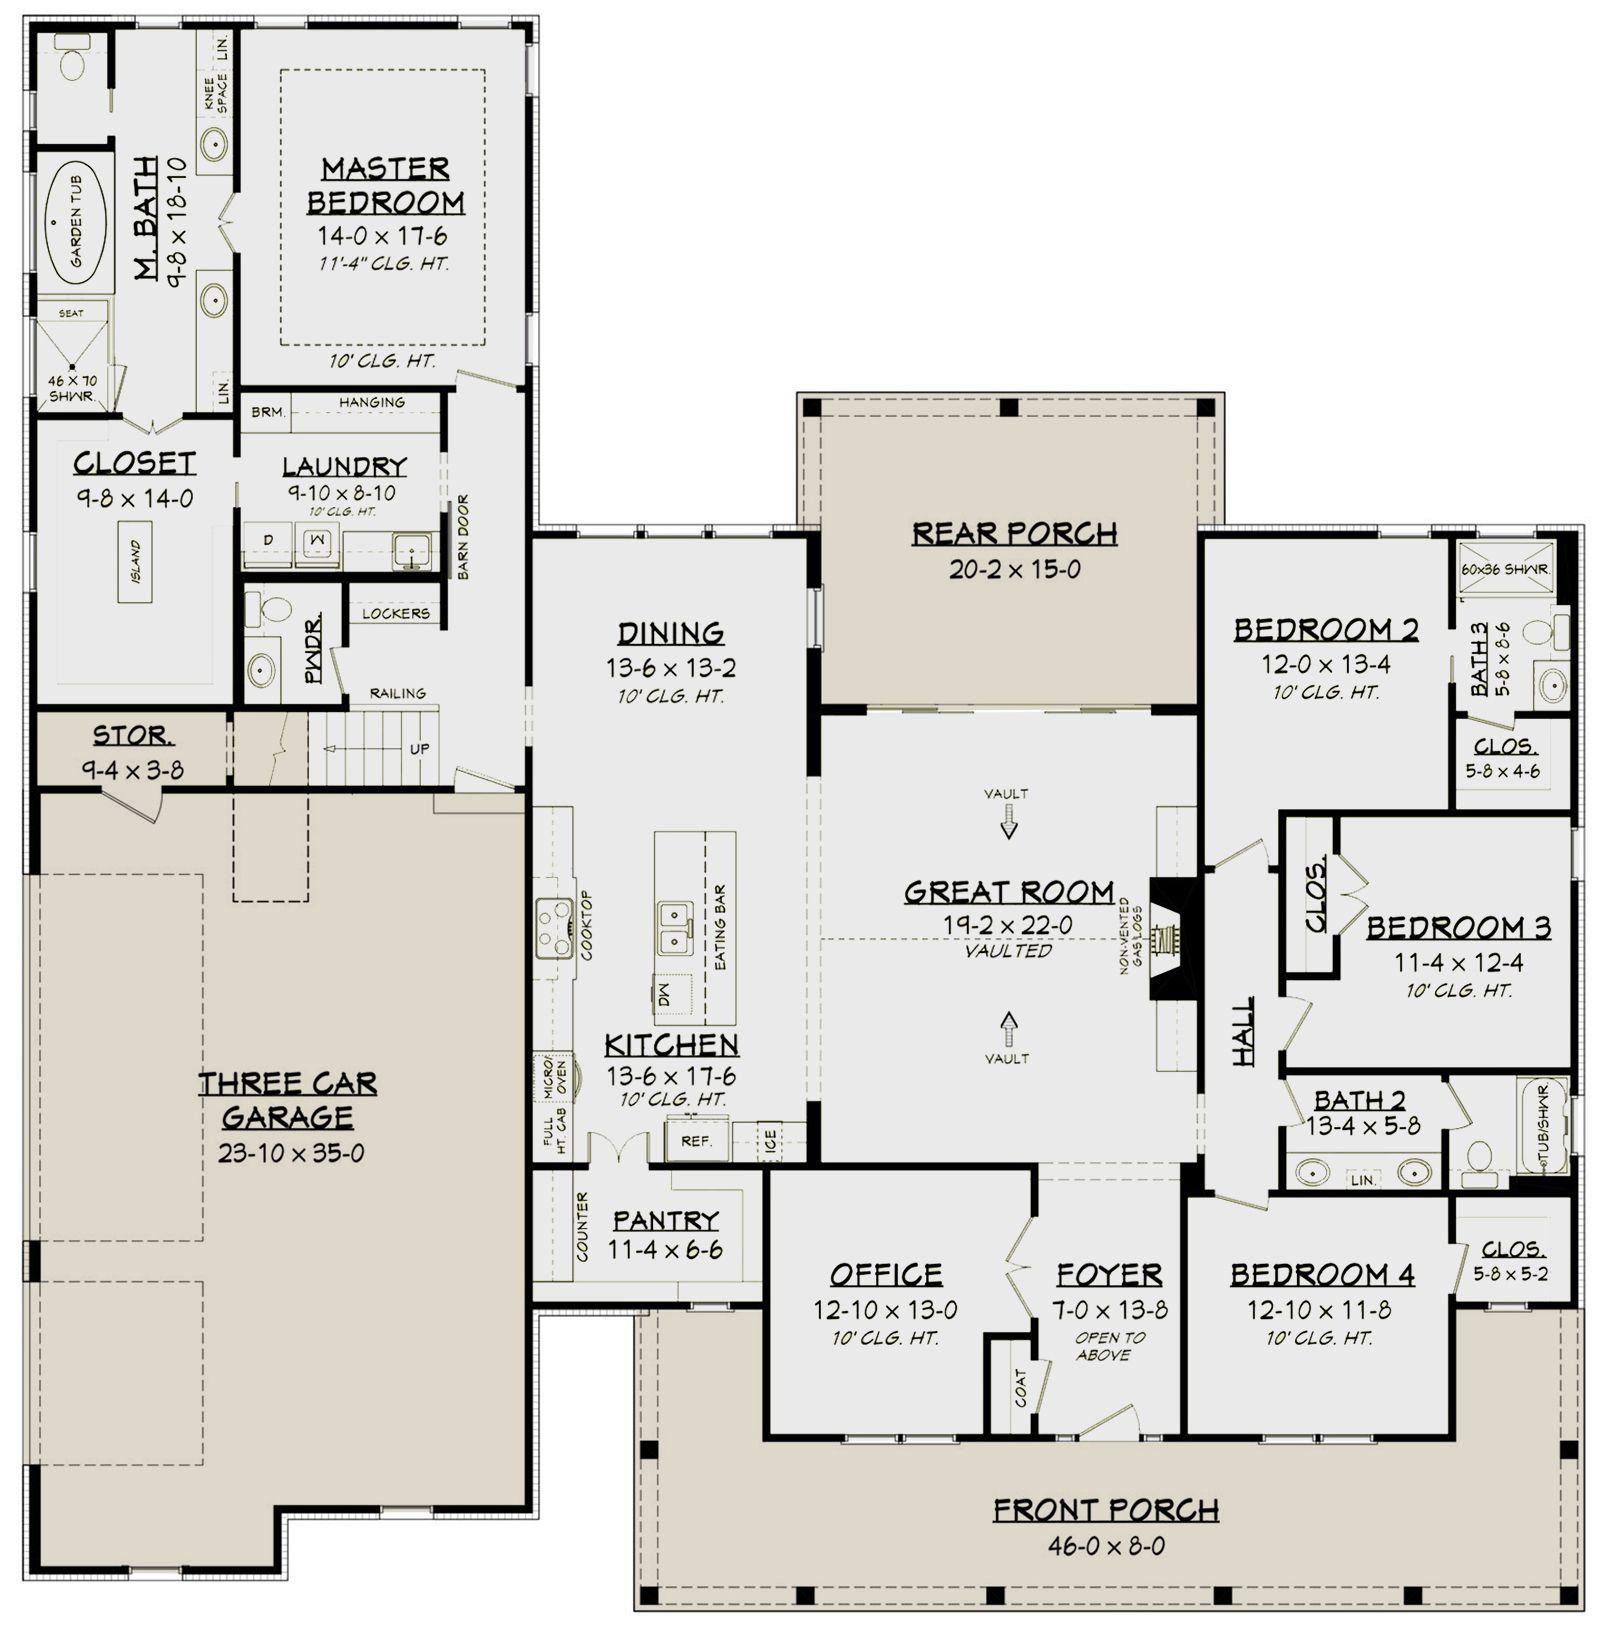 House Plan 041 00179 Modern Farmhouse Plan 2 926 Square Feet 4 5 Bedrooms 3 5 Bathrooms New House Plans House Plans Farmhouse Farmhouse Style House